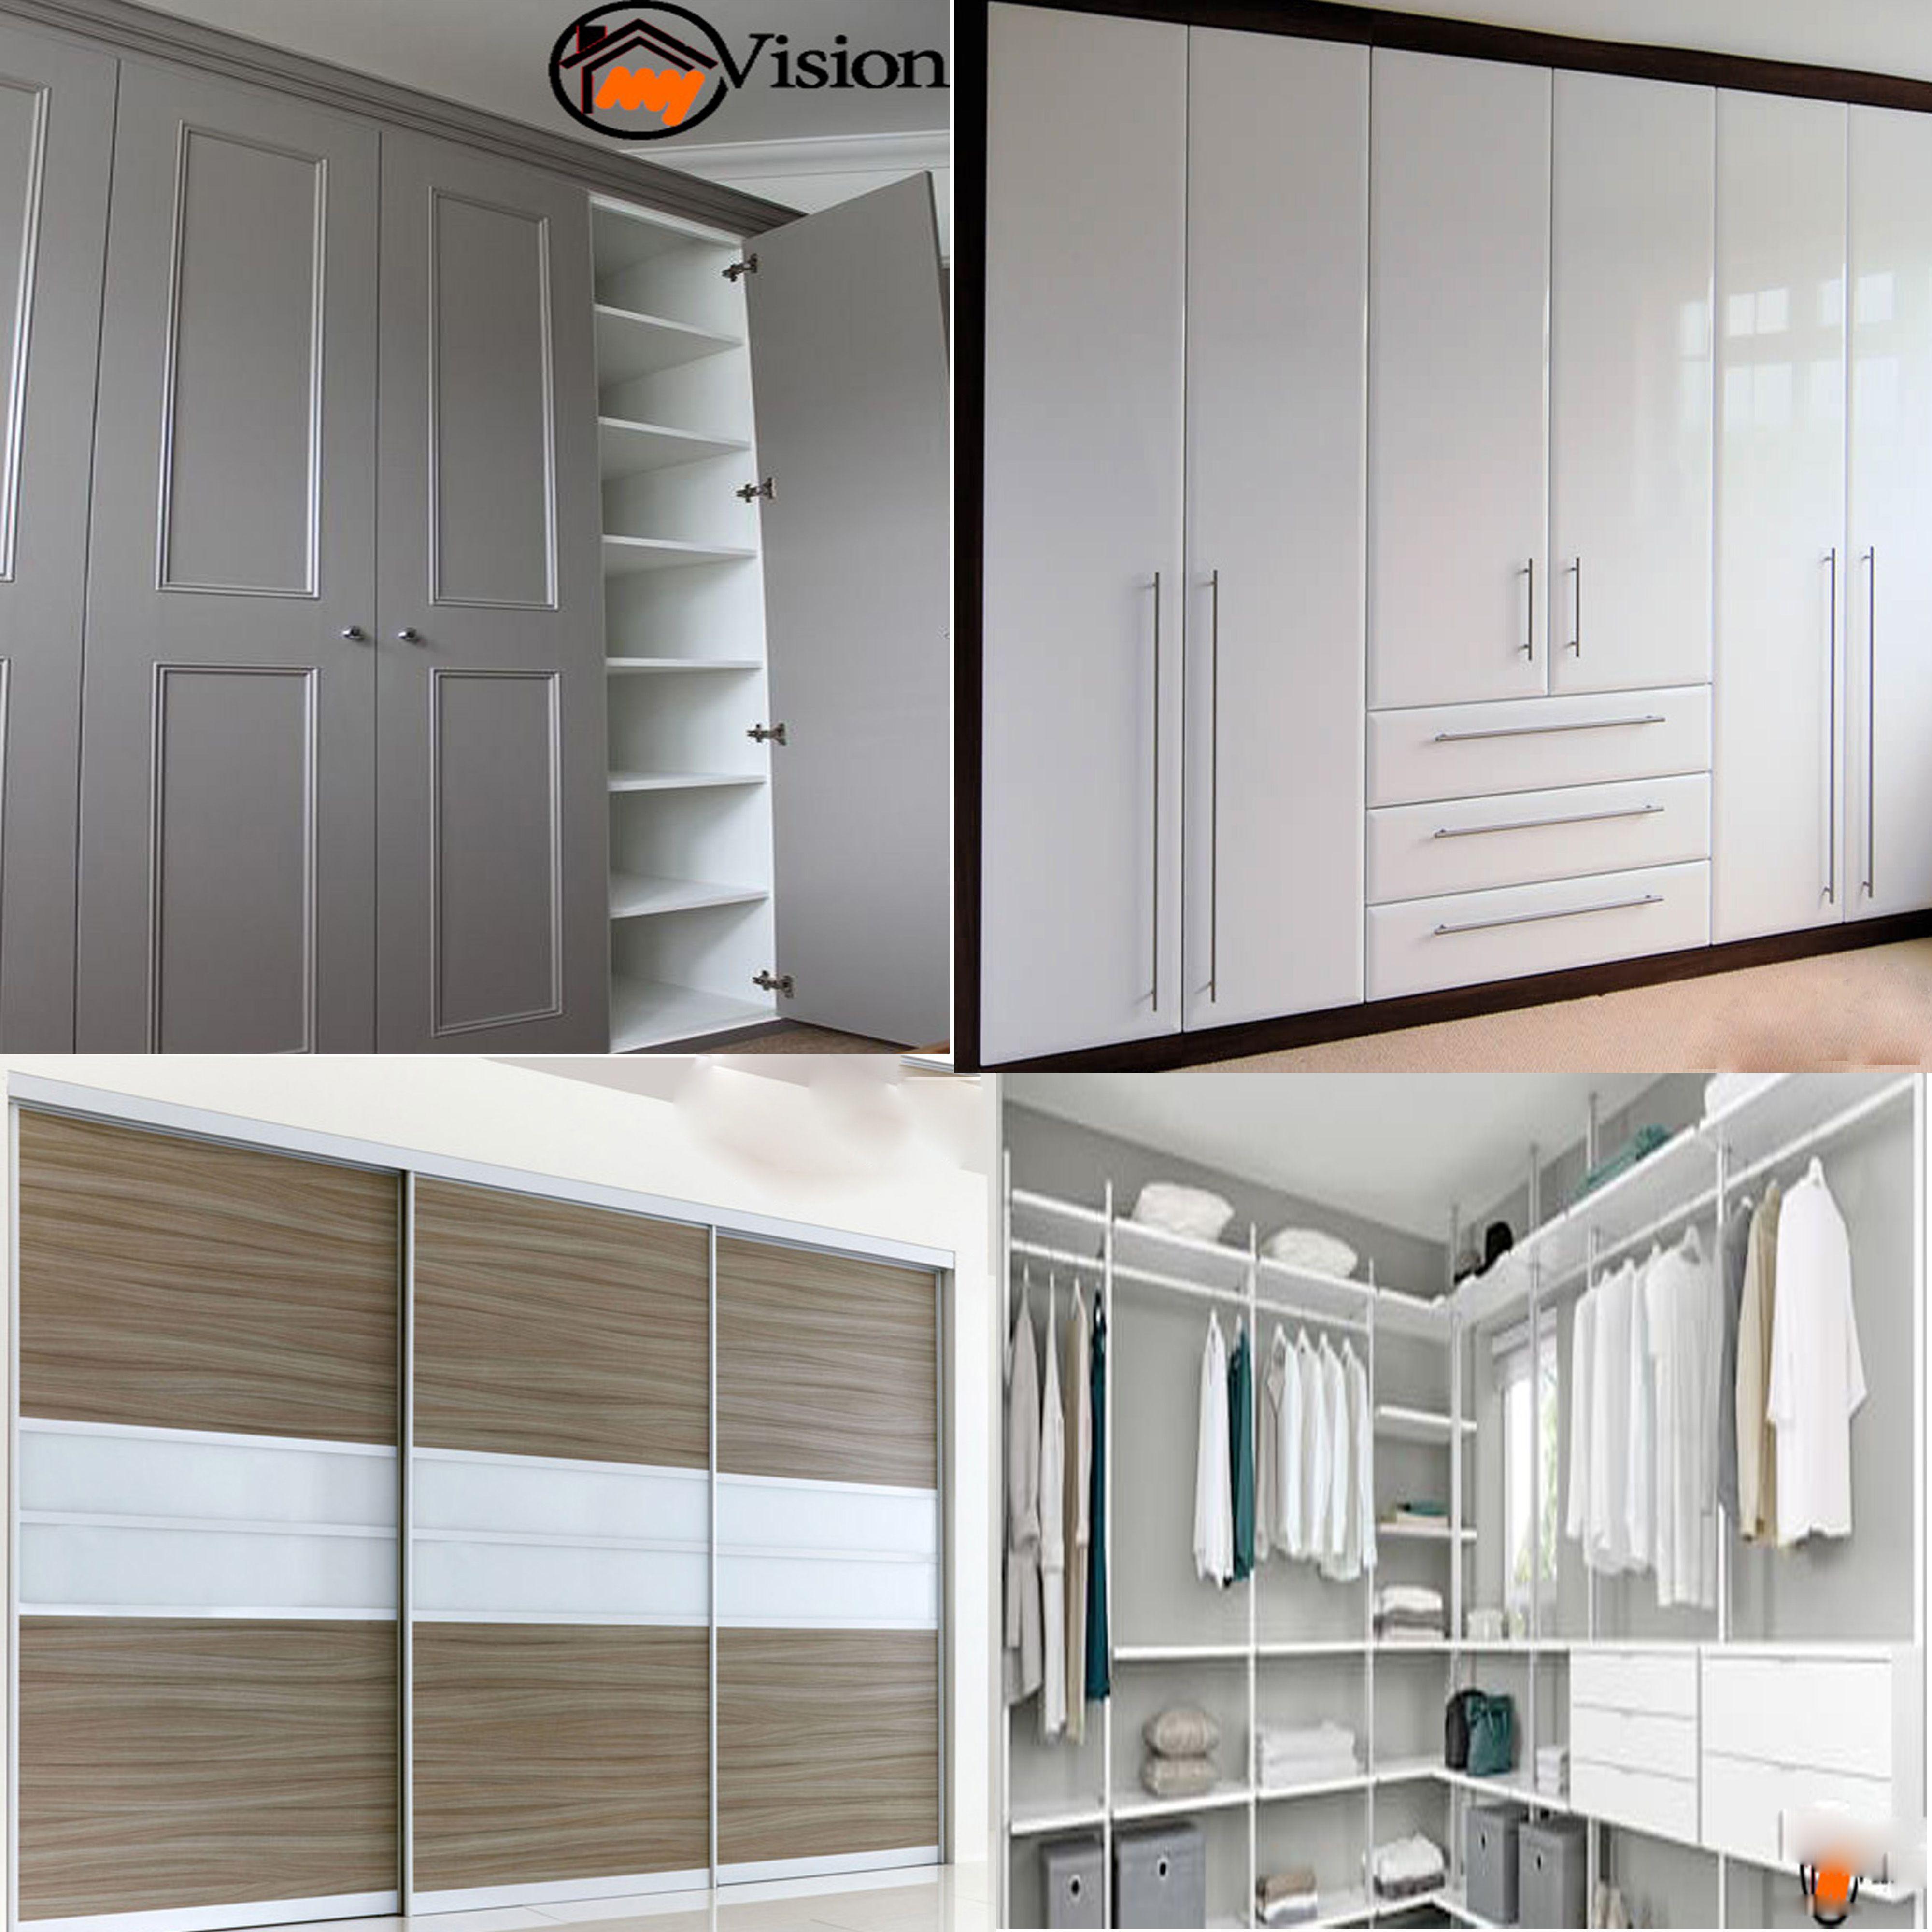 Best Wardrobe Designs In Hyderabad Bedroom Hall Kitchen Cupboards Designer And Interior Wardrobe Manufacturers Wardrobe Design Best Wardrobe Designs Bedroom Wardrobe